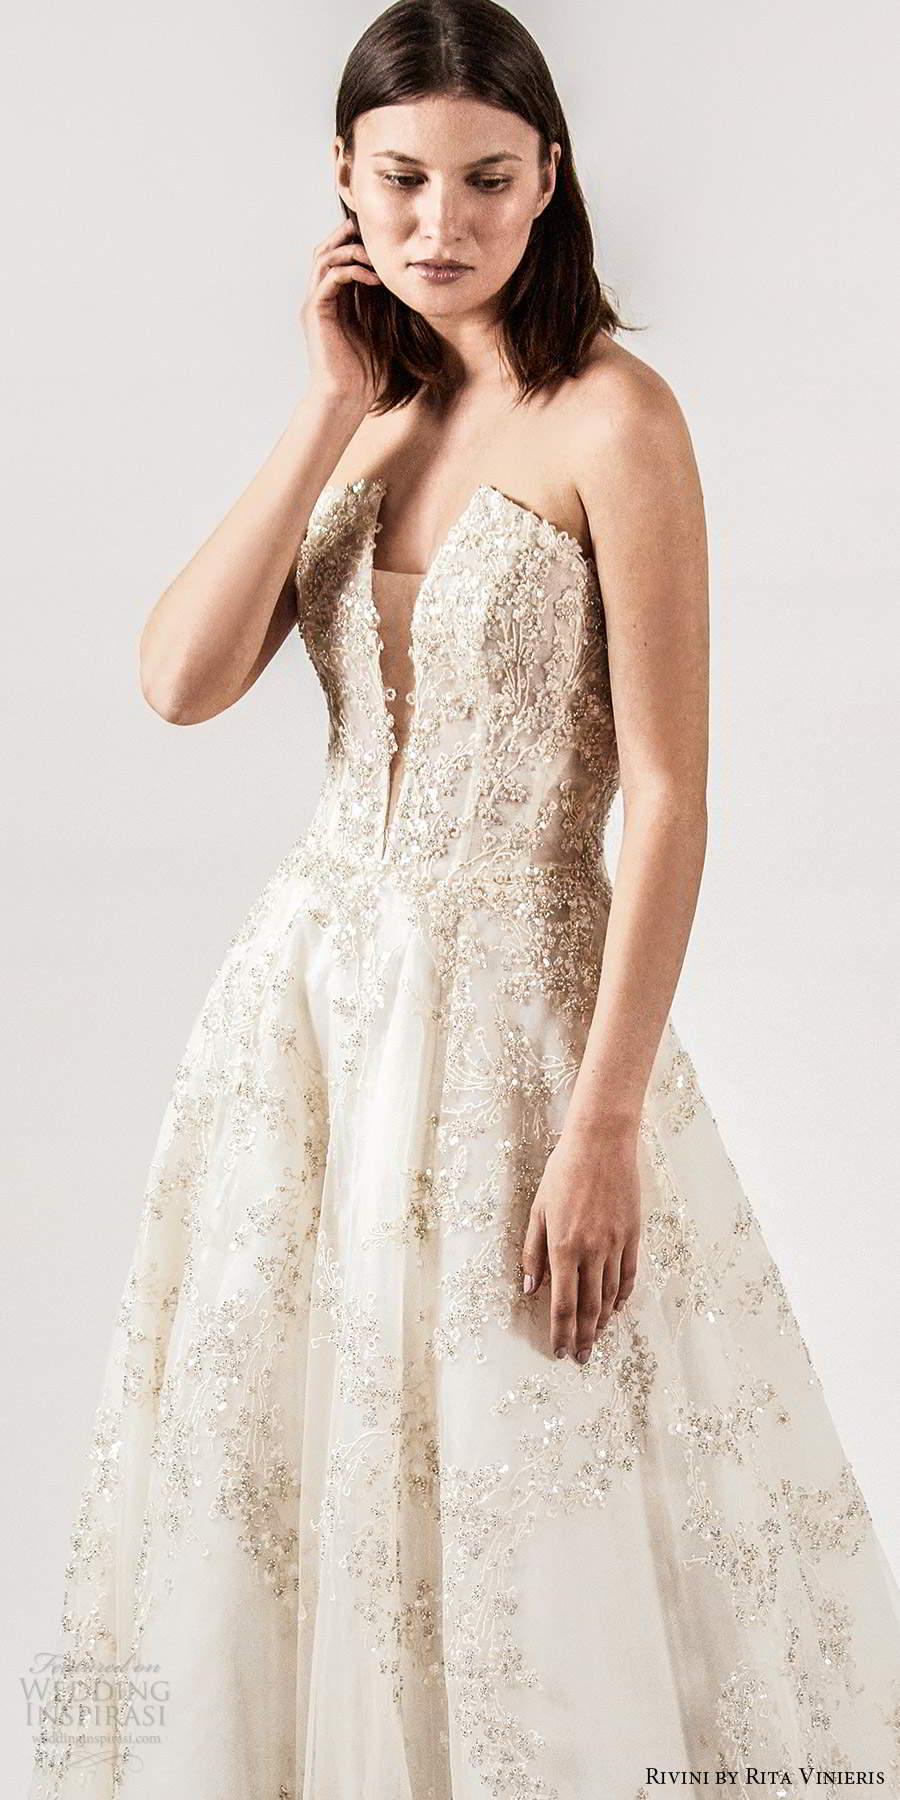 rivini rita vinieris spring 2021 bridal strapless straight across split neckline fully embellished a line ball gown wedding dress champagne chapel train (4) lv